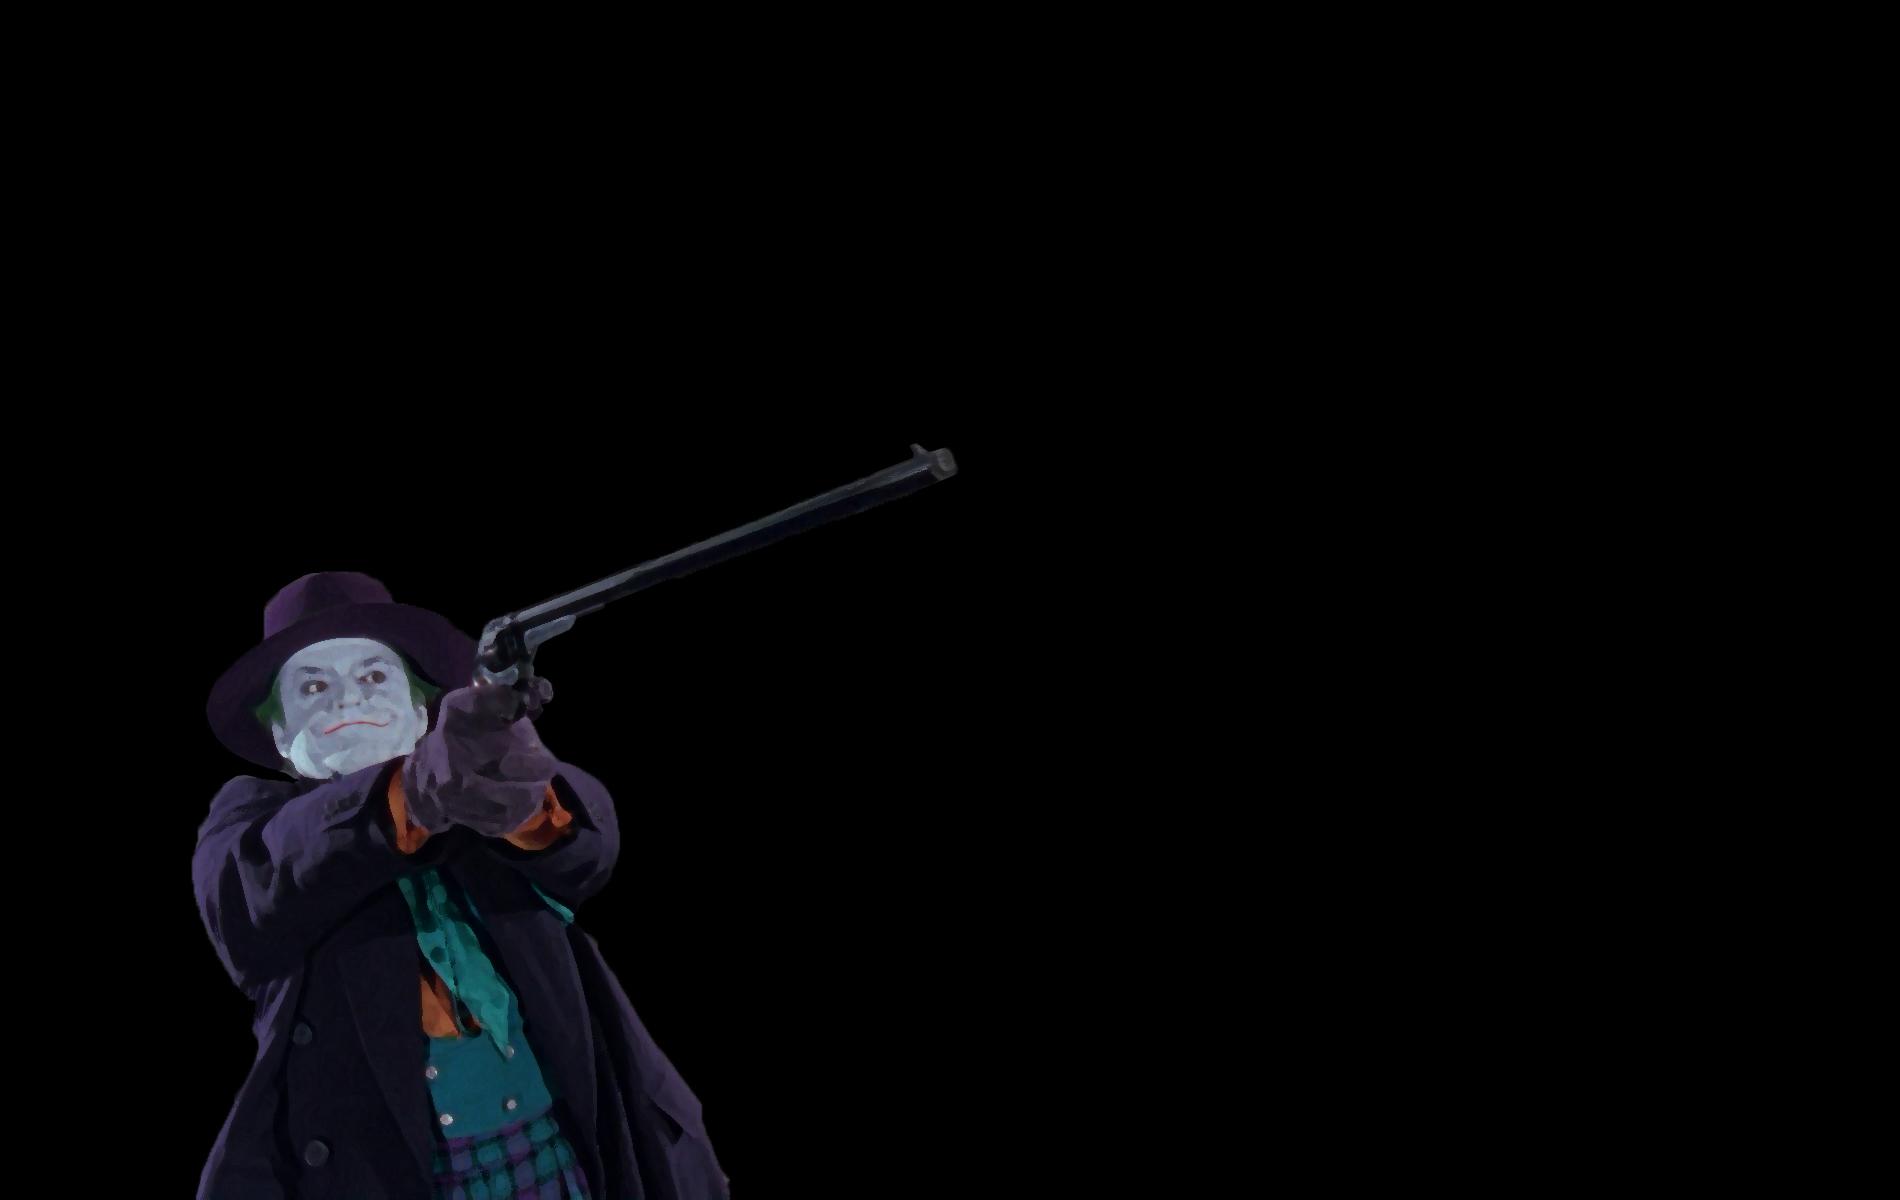 Joker Comic Wallpaper HD 1900x1200